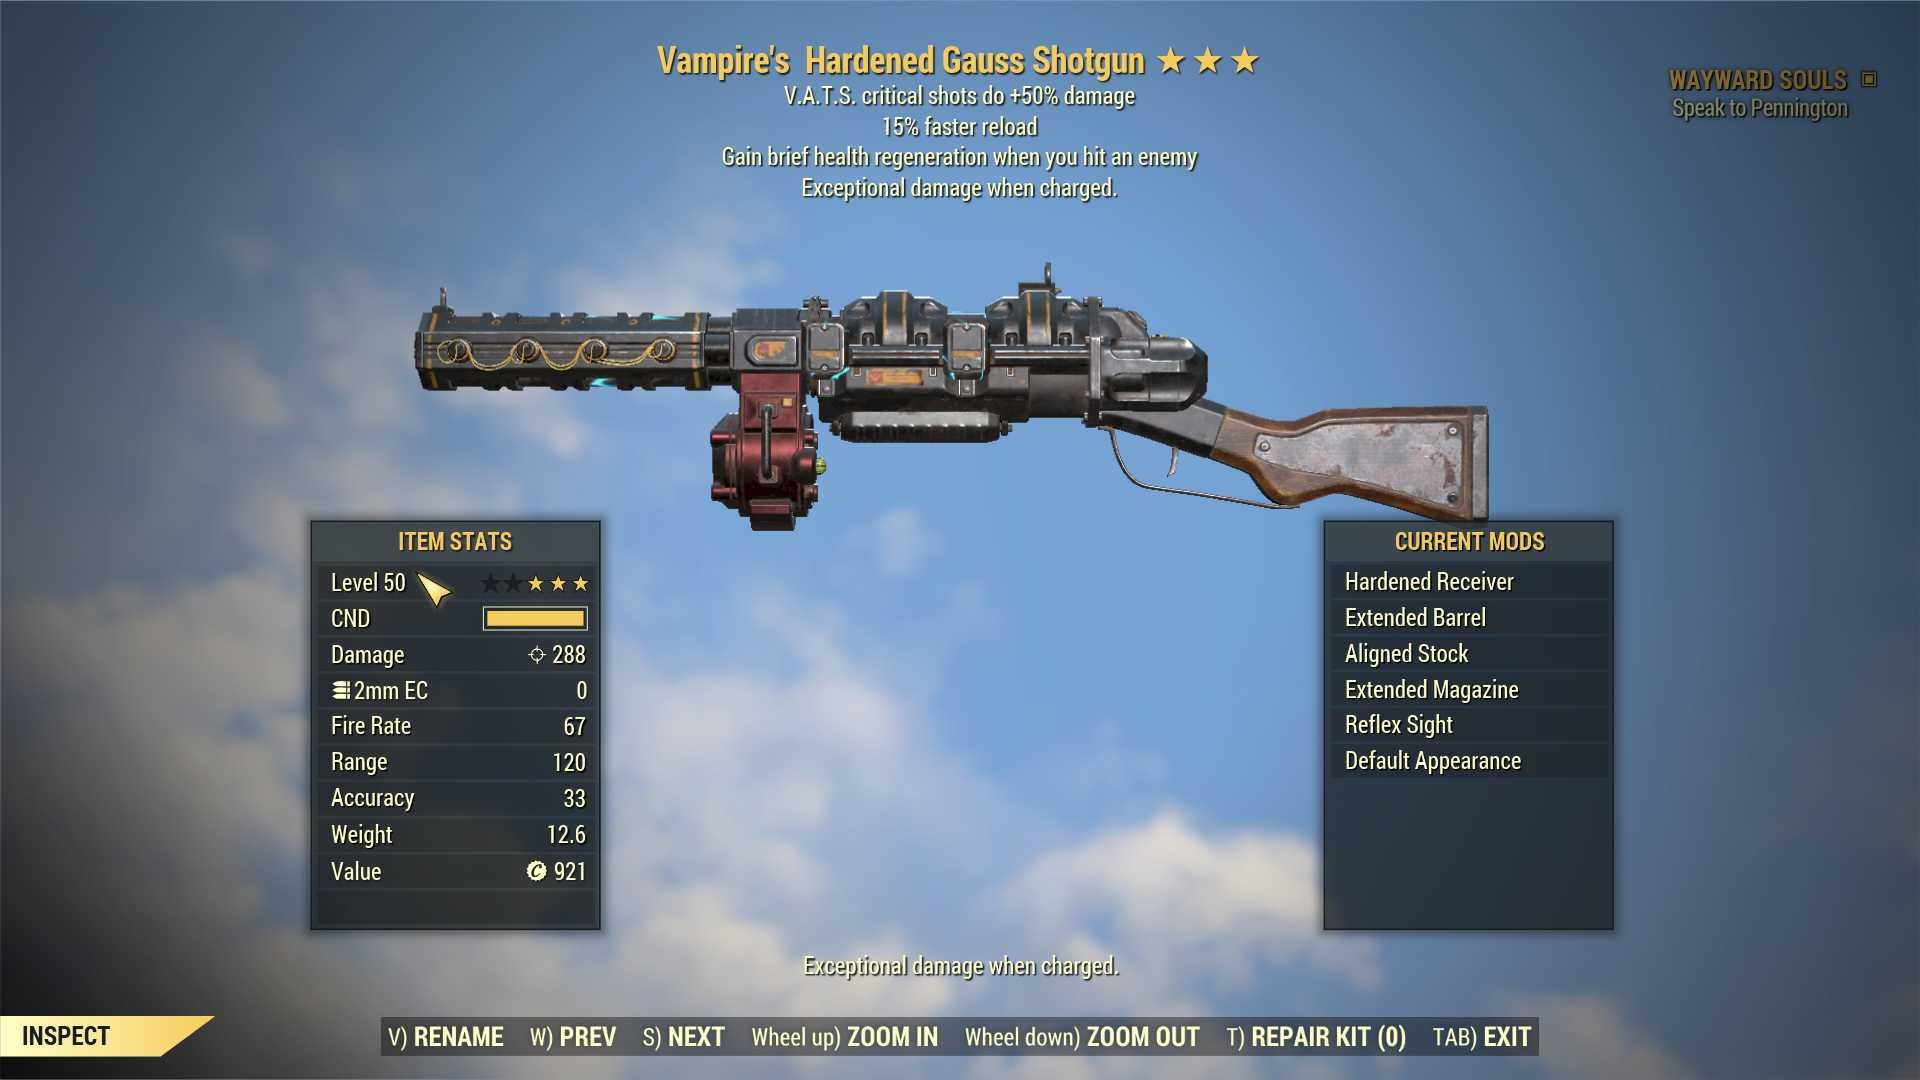 Vampire's Gauss Shotgun (+50% critical damage, 15% faster reload) FULL MODDED [Wastelanders]